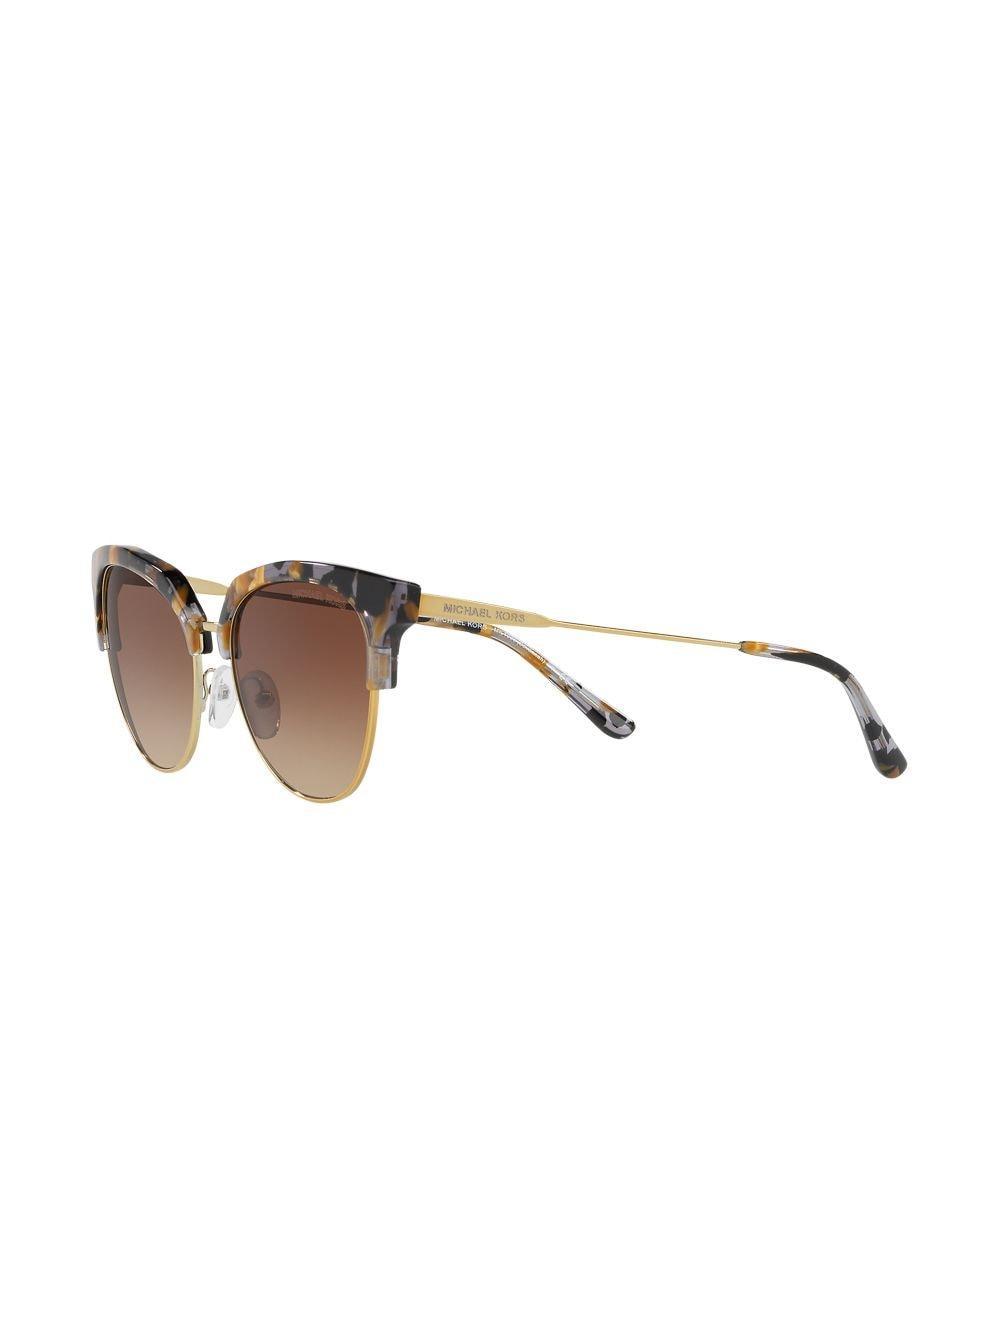 Michael Kors Cat-eye Shaped Sunglasses in Gold (Metallic)